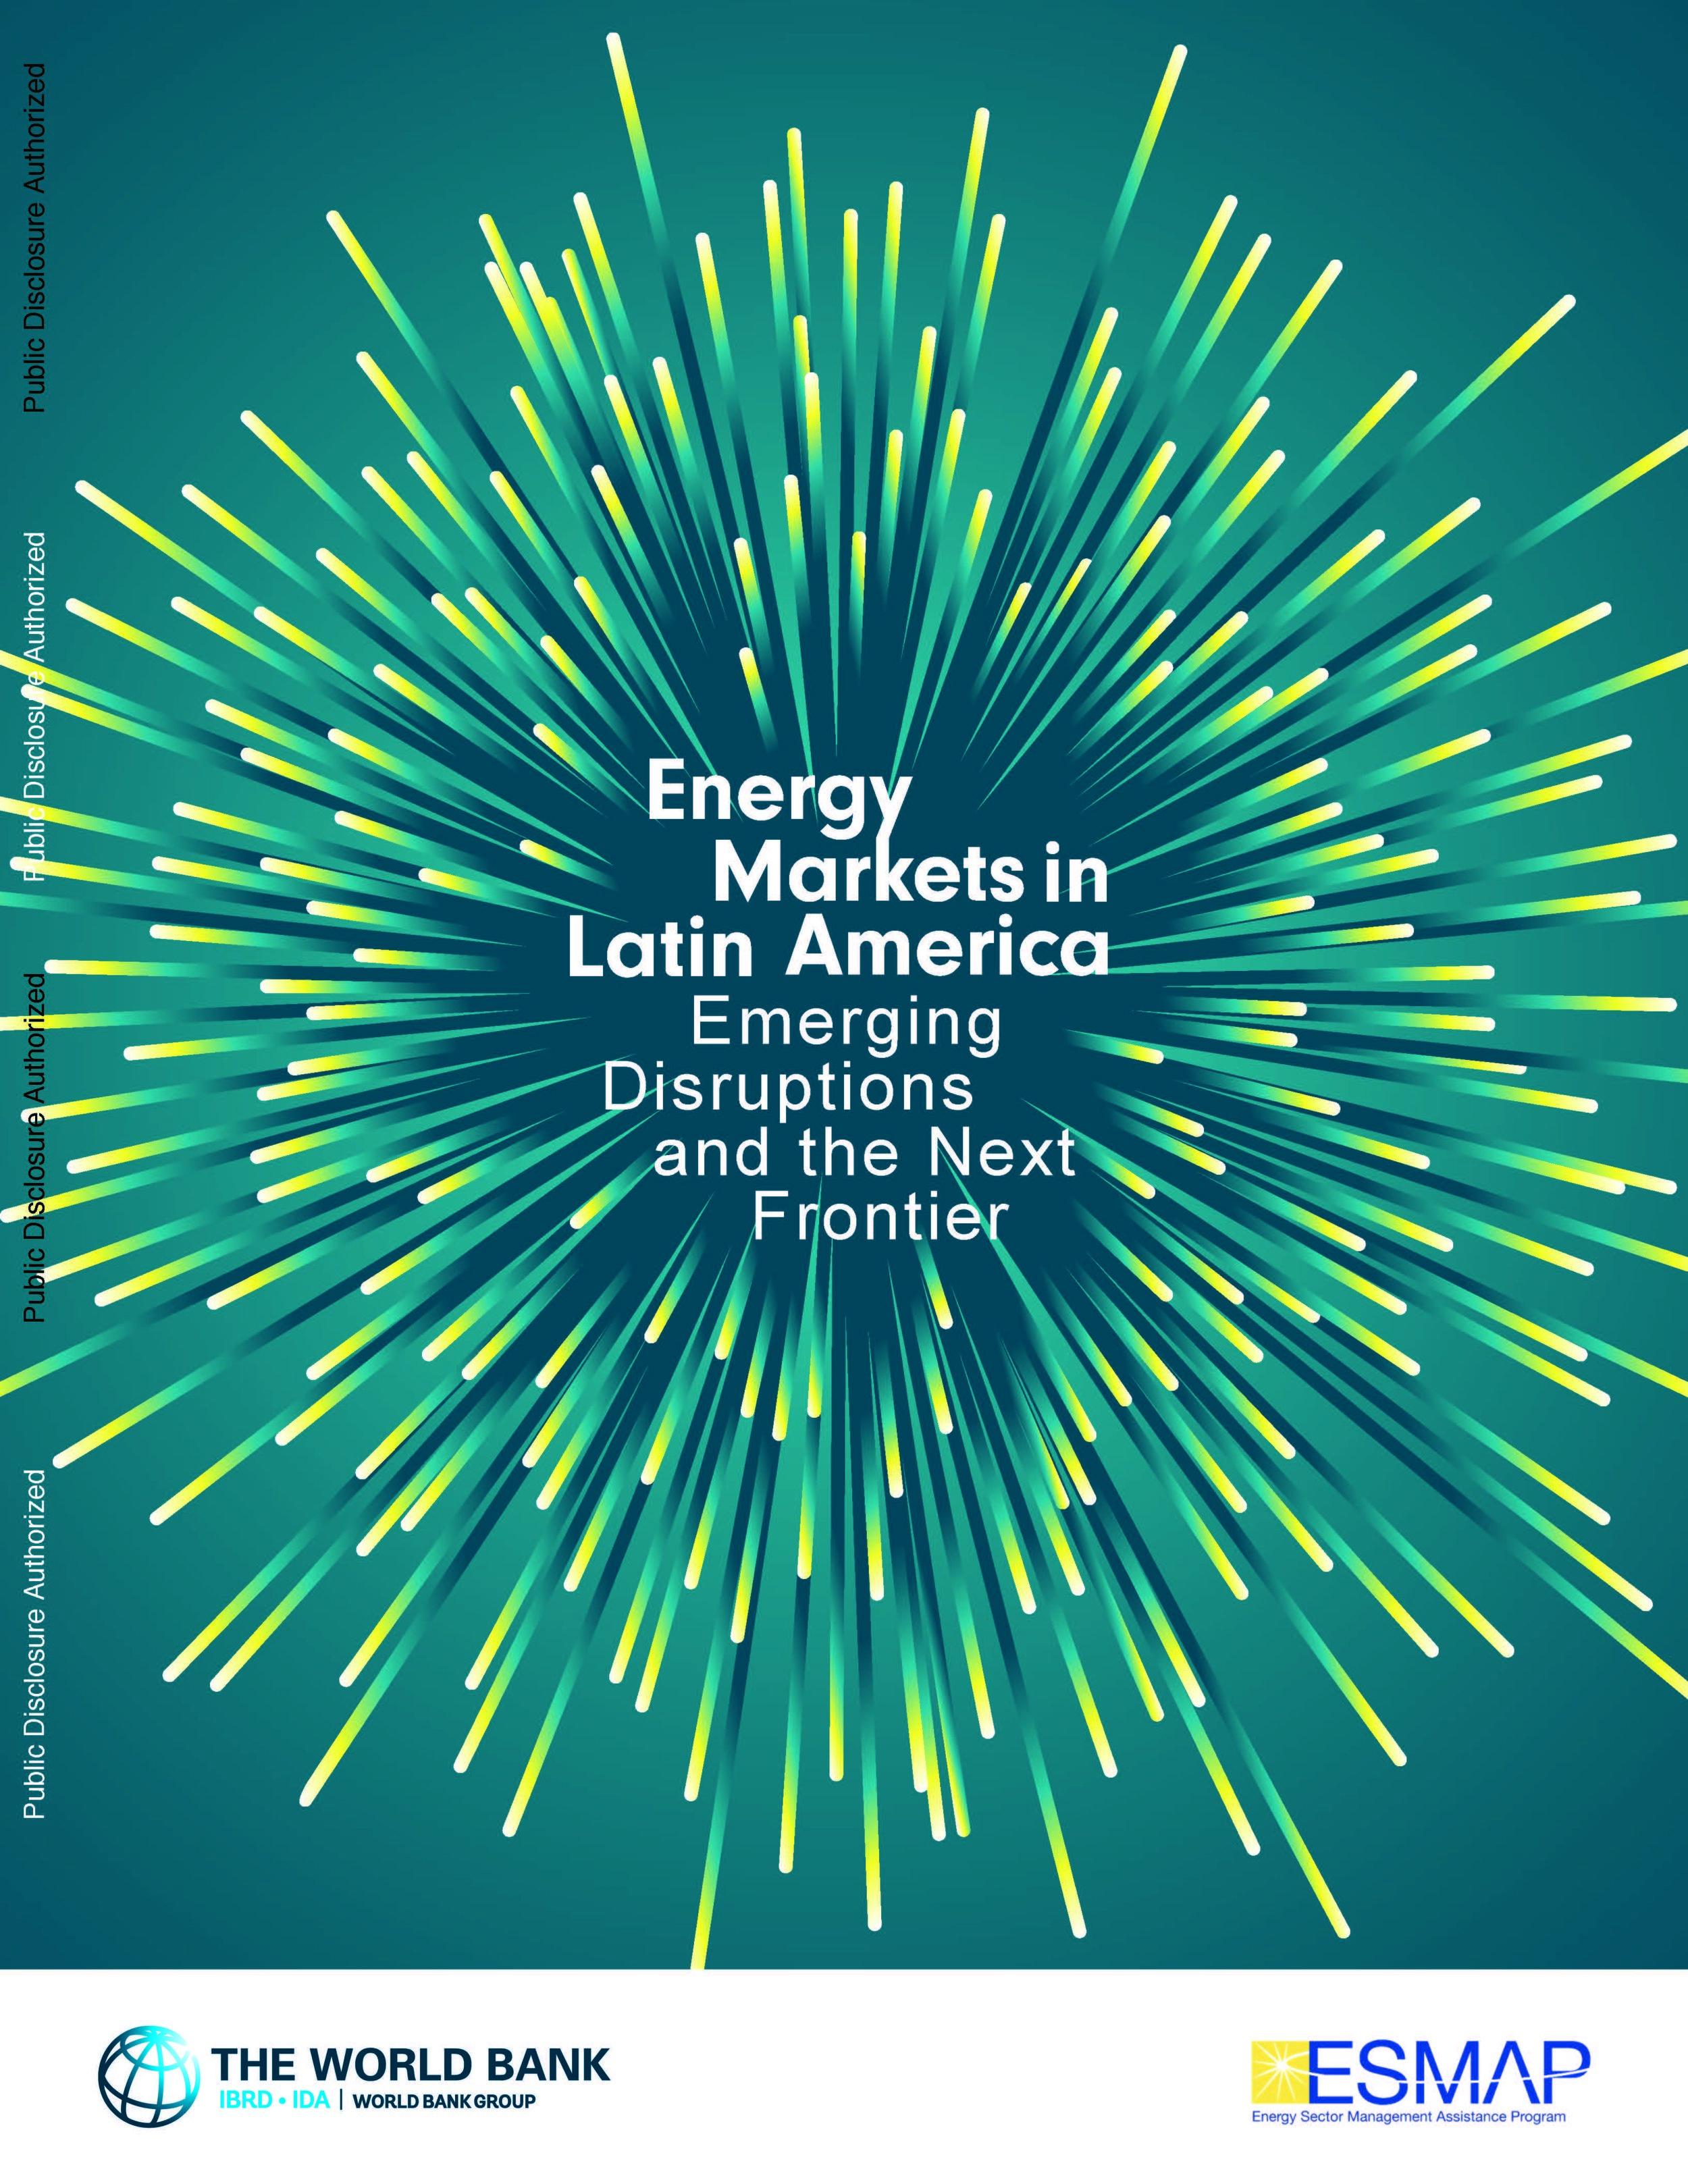 Energy Mkts in Lat Am_2017 1.jpg